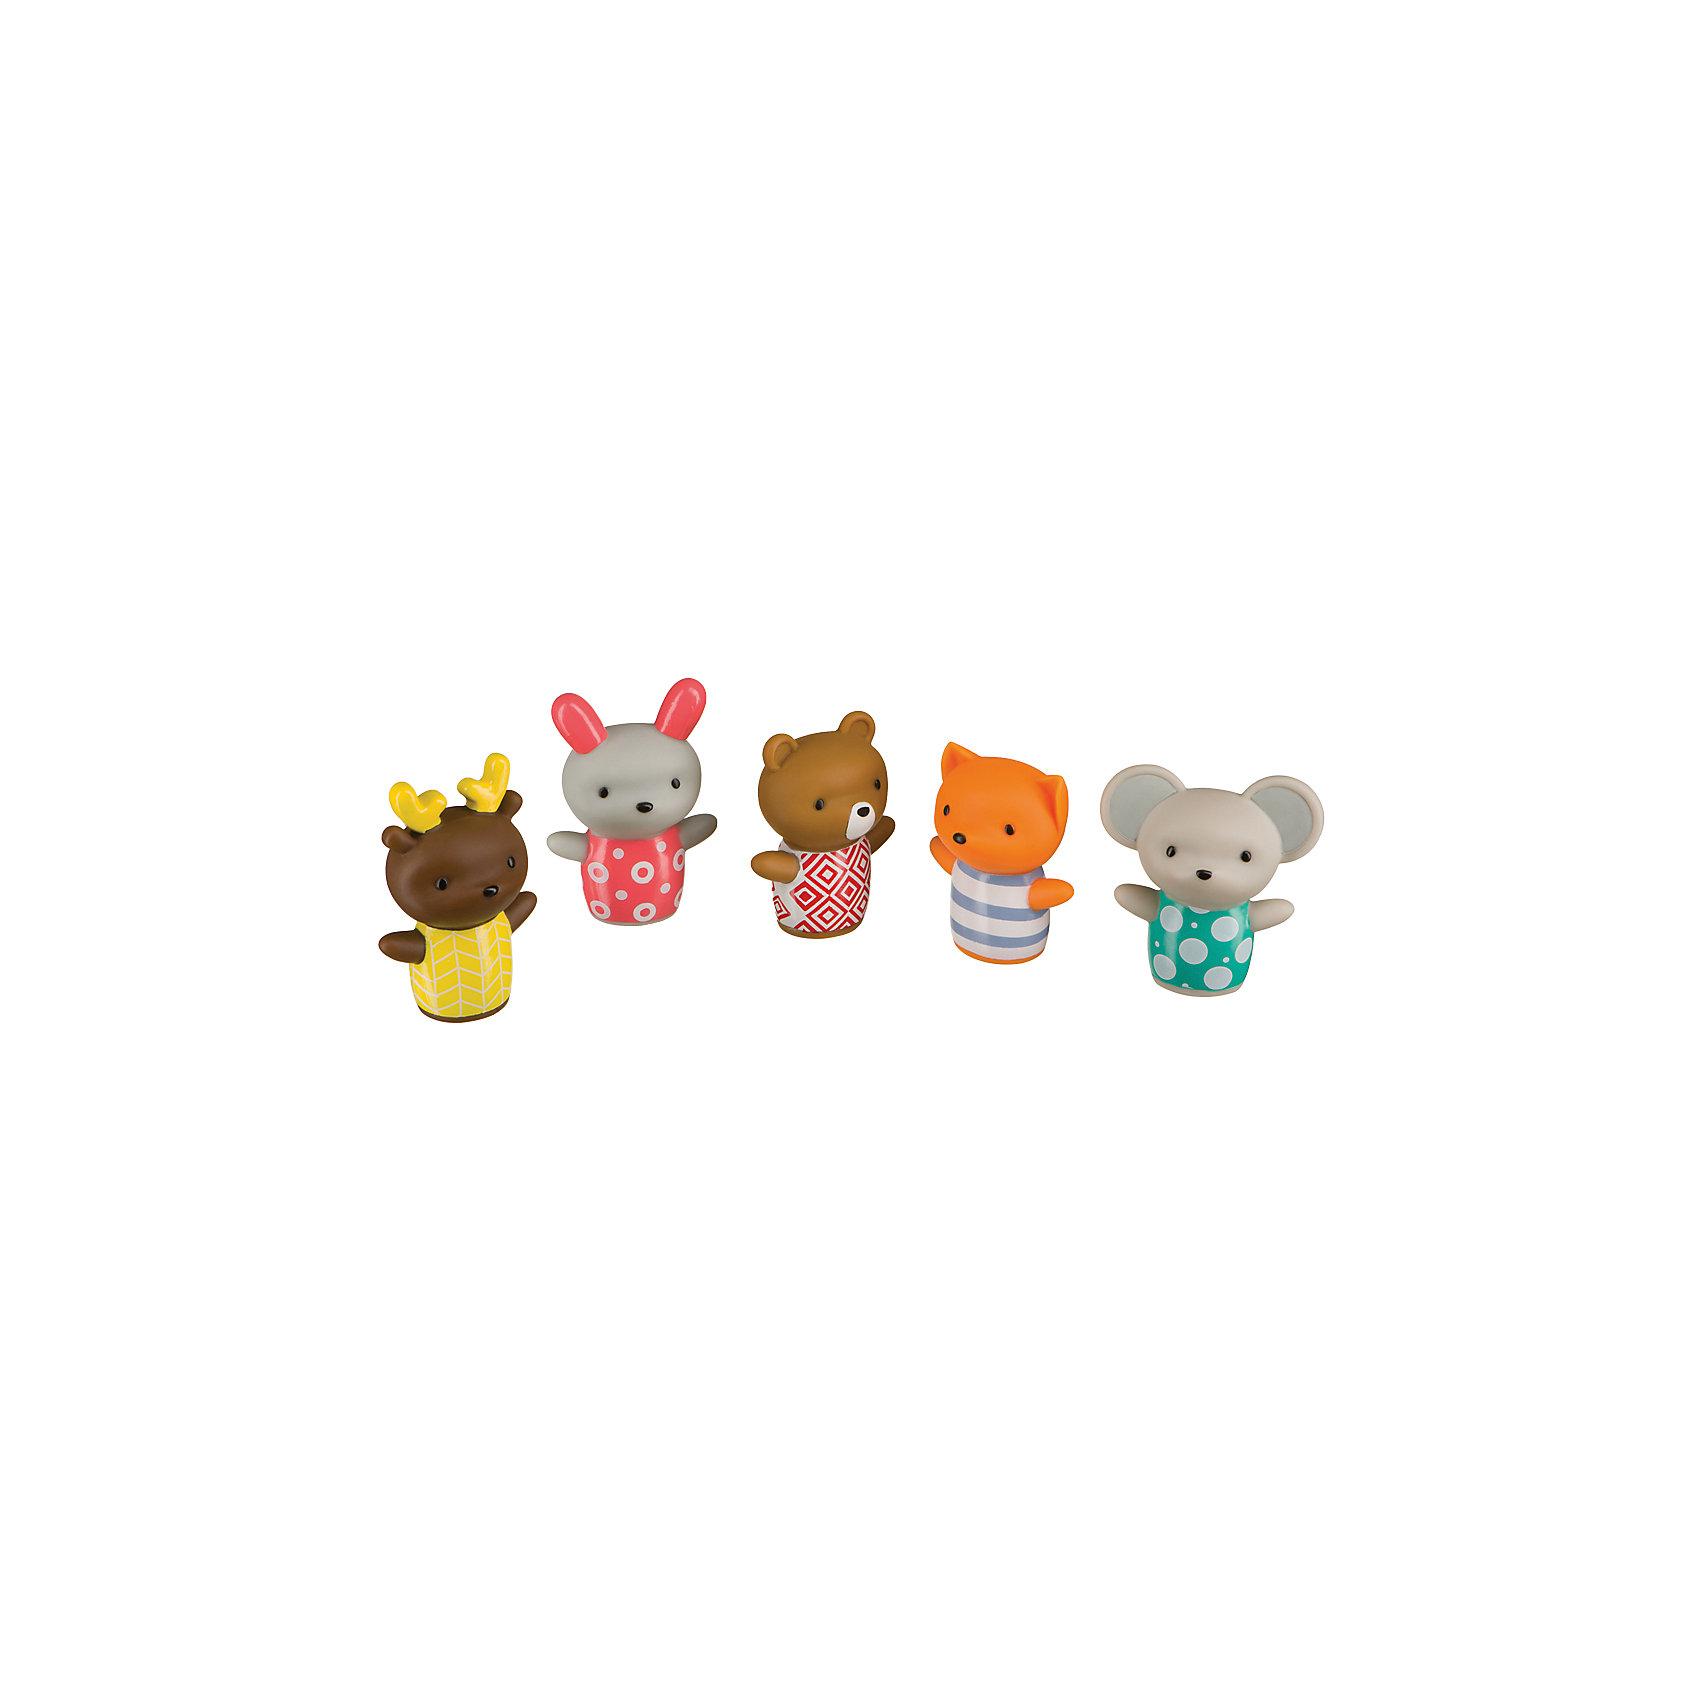 Набор ПВХ-игрушек для ванны LITTLE FRIENDS, Happy BabyИгрушки ПВХ<br><br><br>Ширина мм: 4<br>Глубина мм: 17<br>Высота мм: 26<br>Вес г: 0<br>Возраст от месяцев: 6<br>Возраст до месяцев: 36<br>Пол: Унисекс<br>Возраст: Детский<br>SKU: 5345703